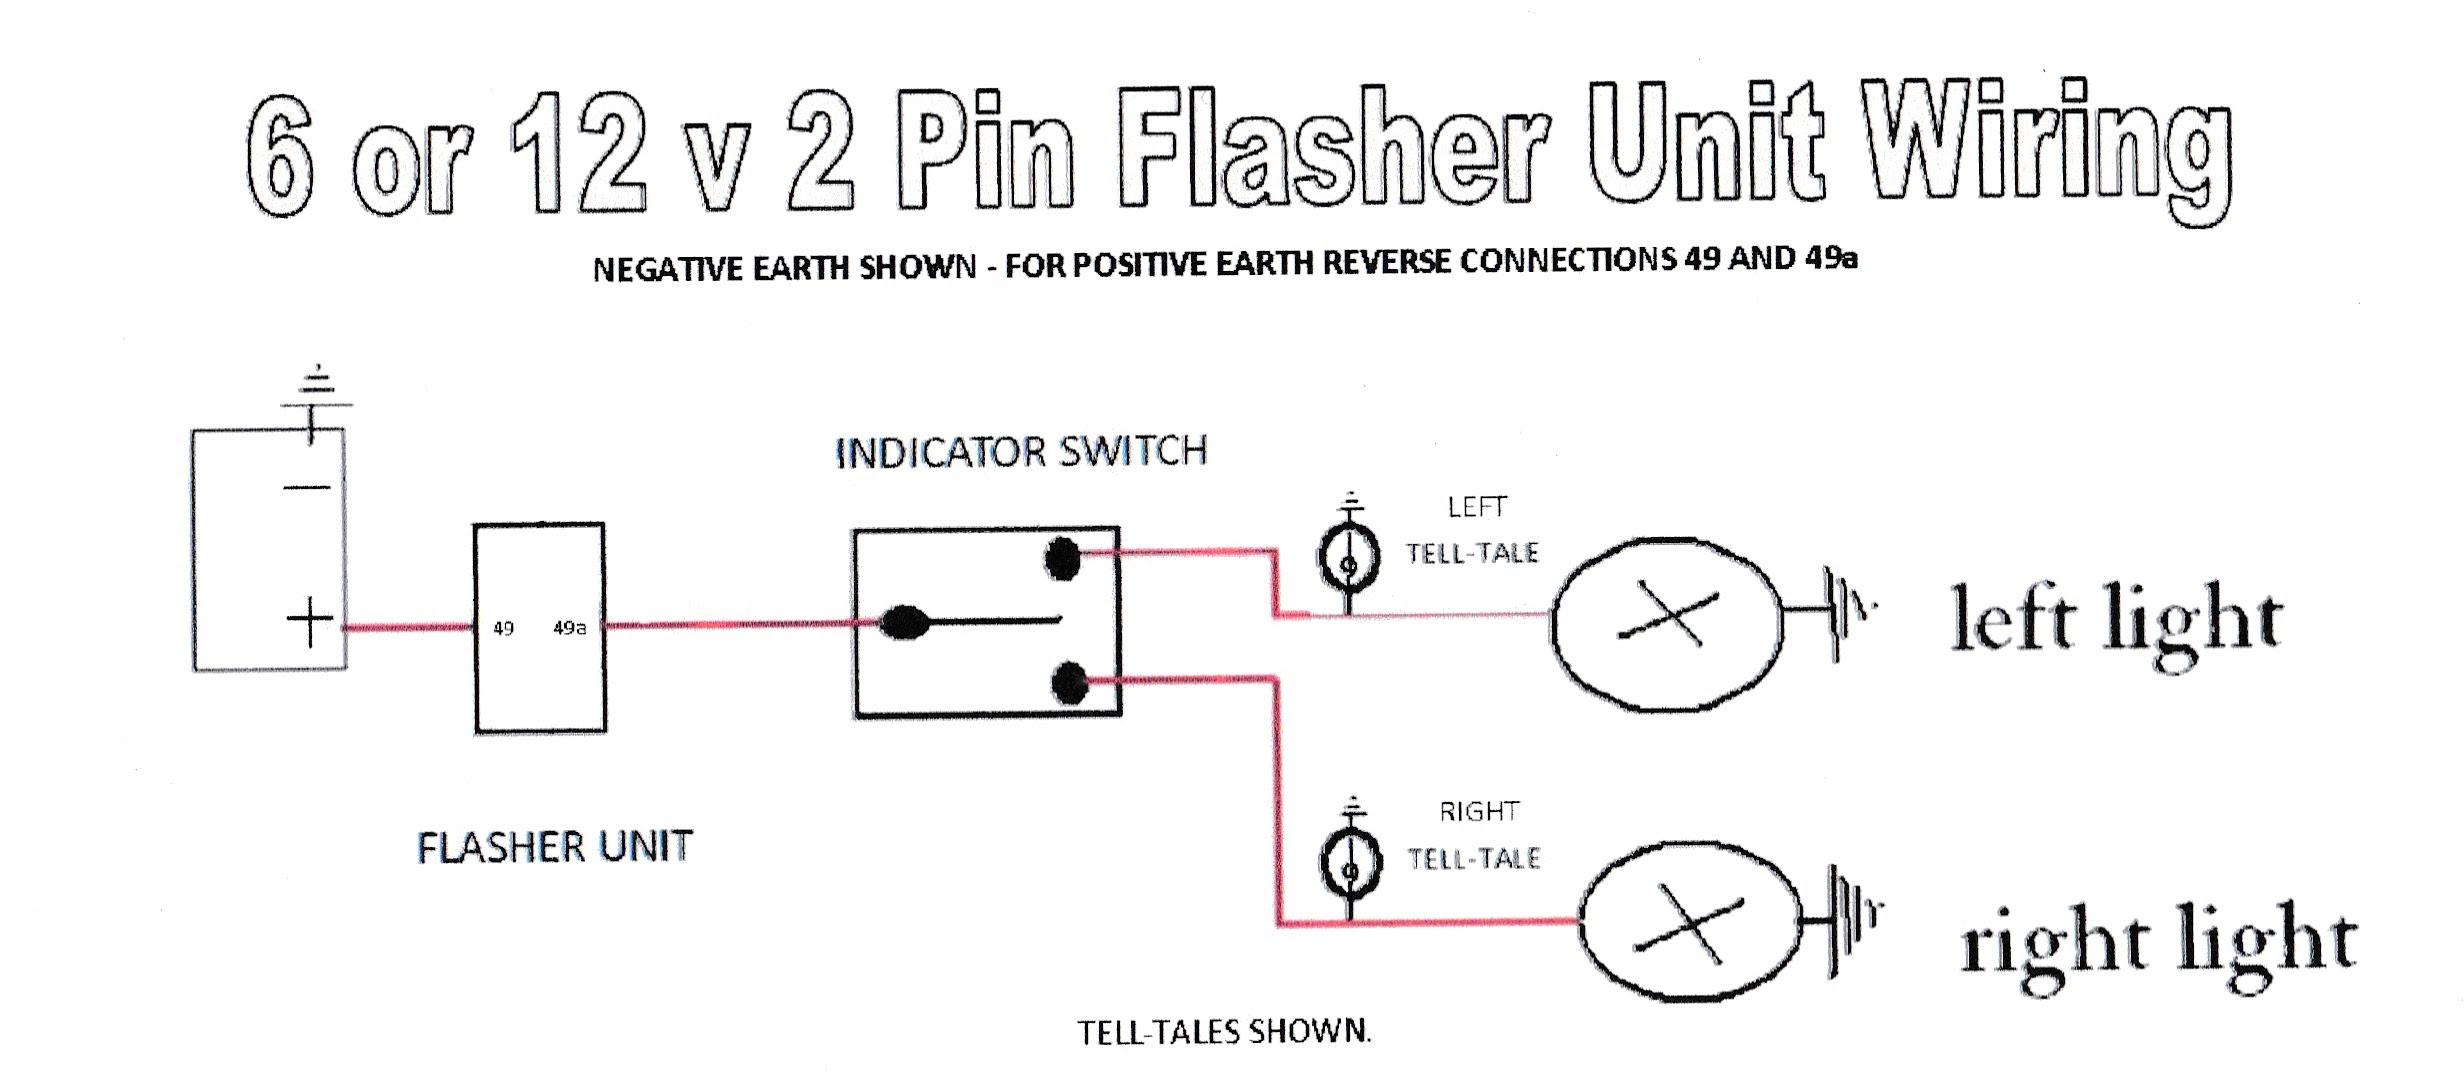 Diagram 3 Pin Flasher Unit Wiring Diagram Full Version Hd Quality Wiring Diagram Diagramshearf Gtaci Fr